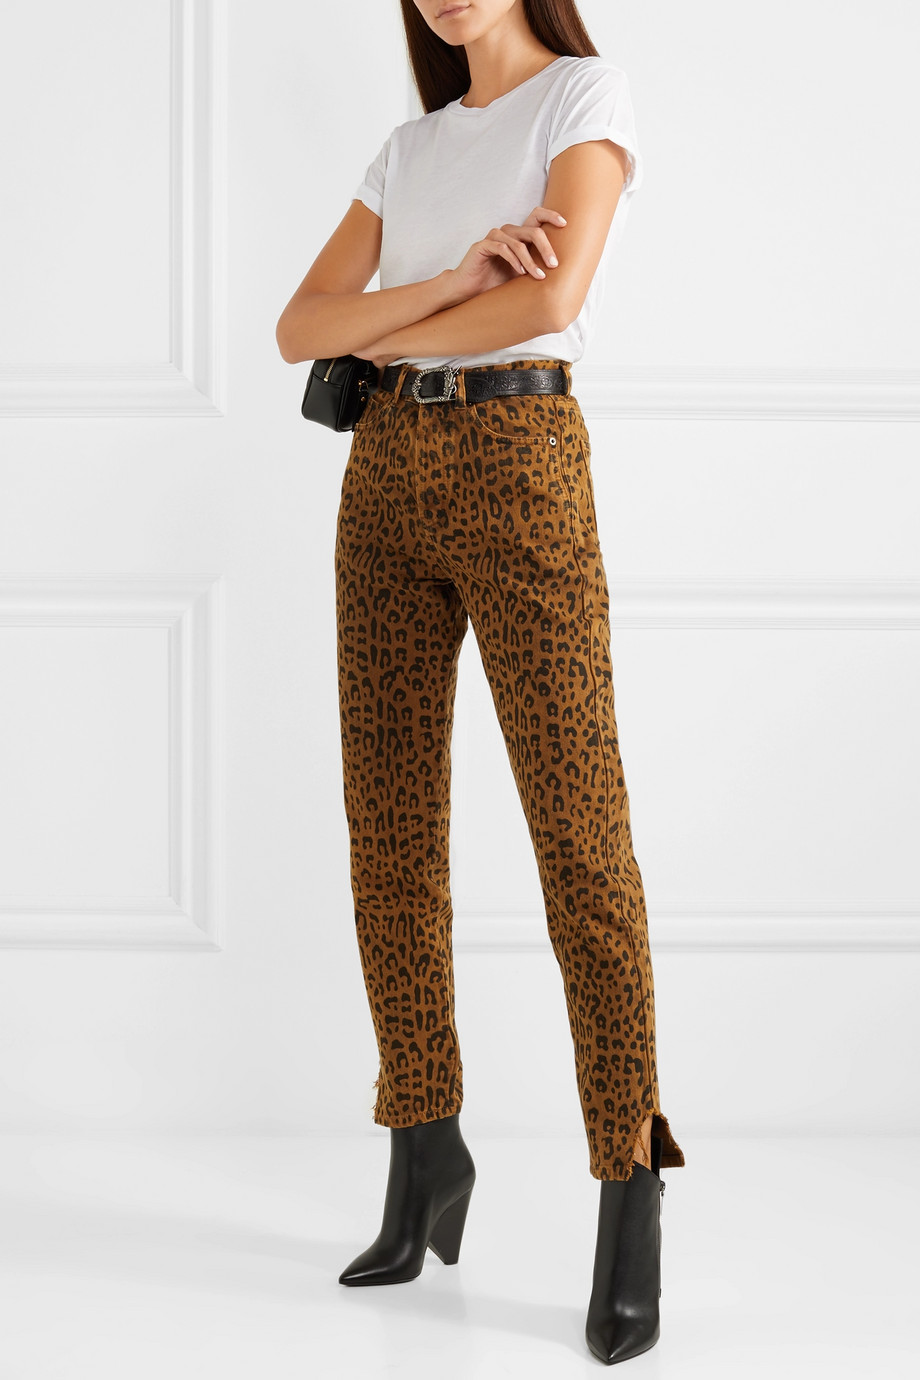 f6efa9586c68 Saint Laurent. Leopard Print High Rise Slim Leg Jeans